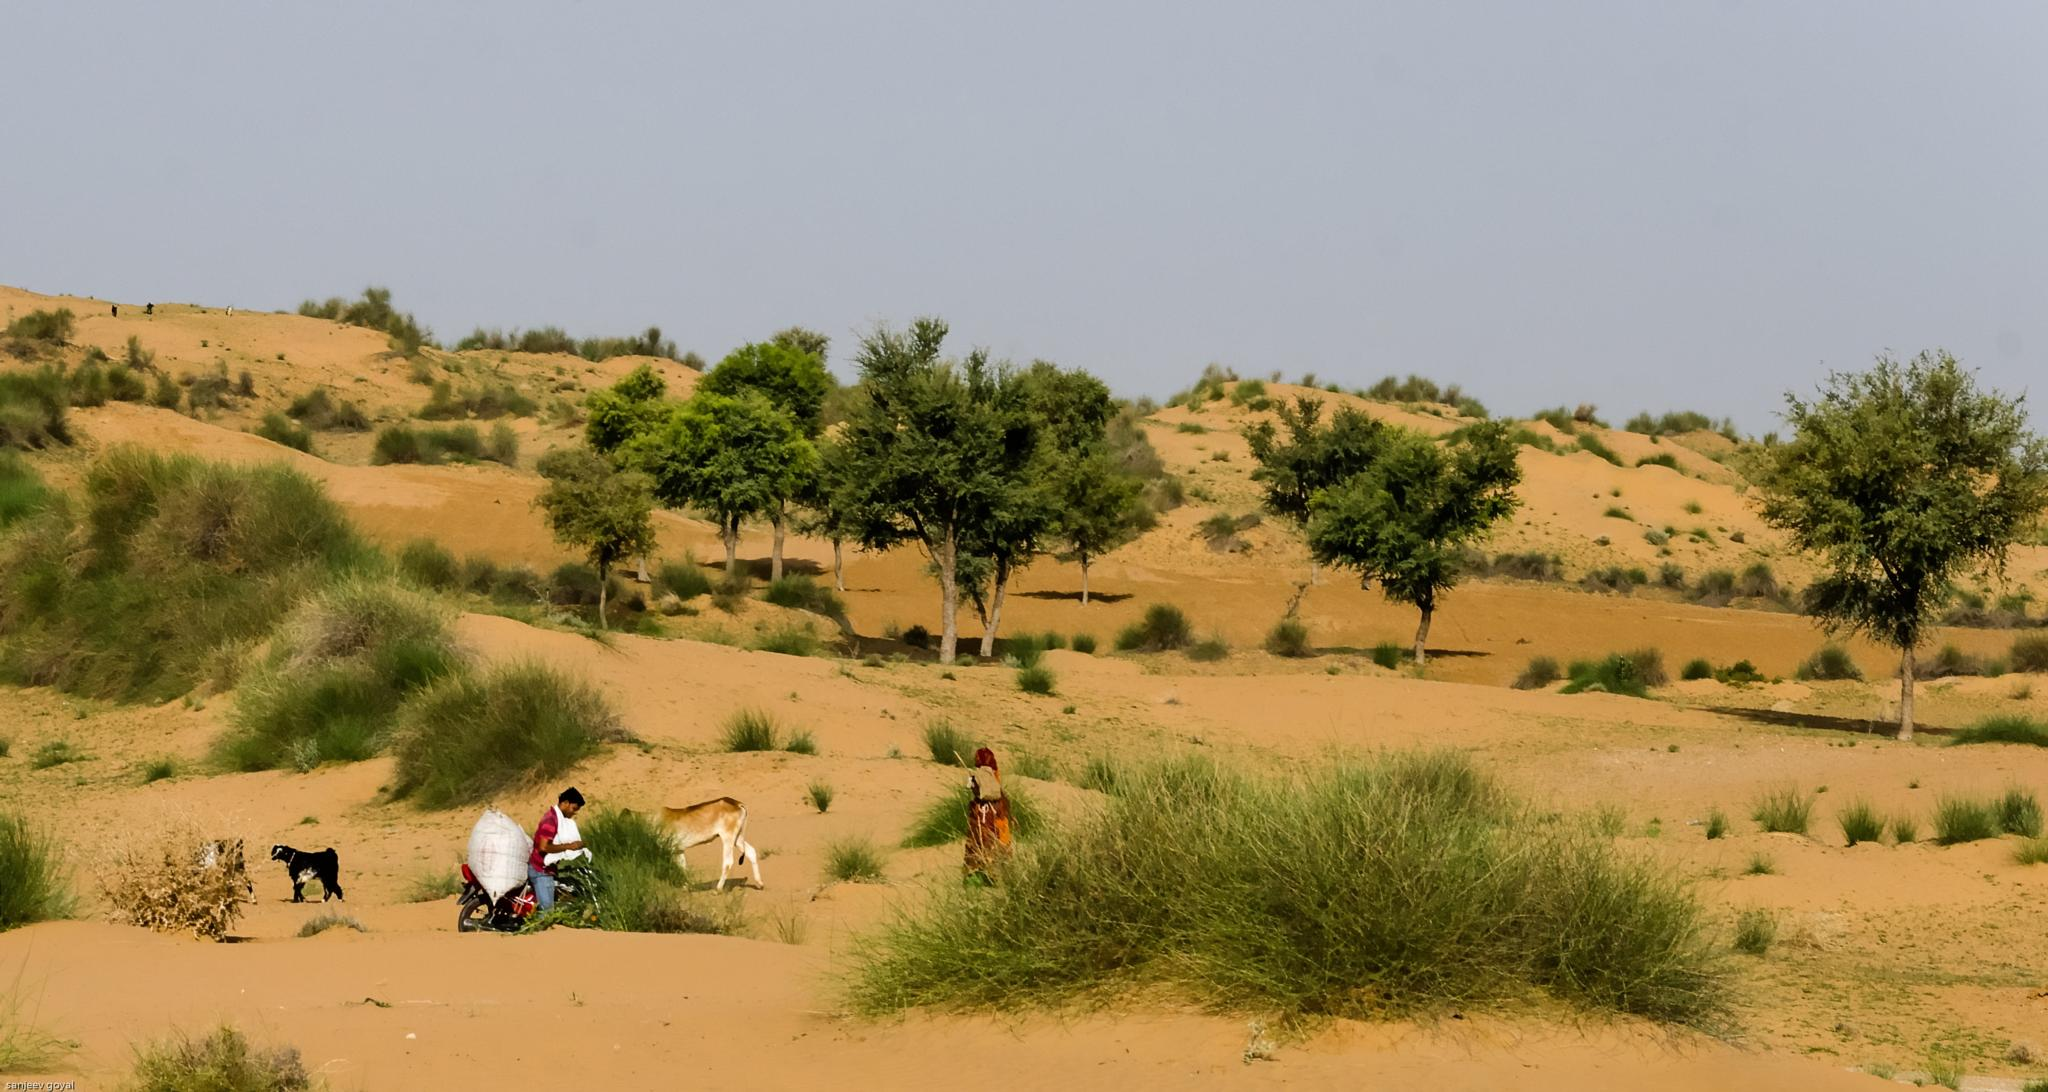 Desert by sanjeev.k.goyal.10